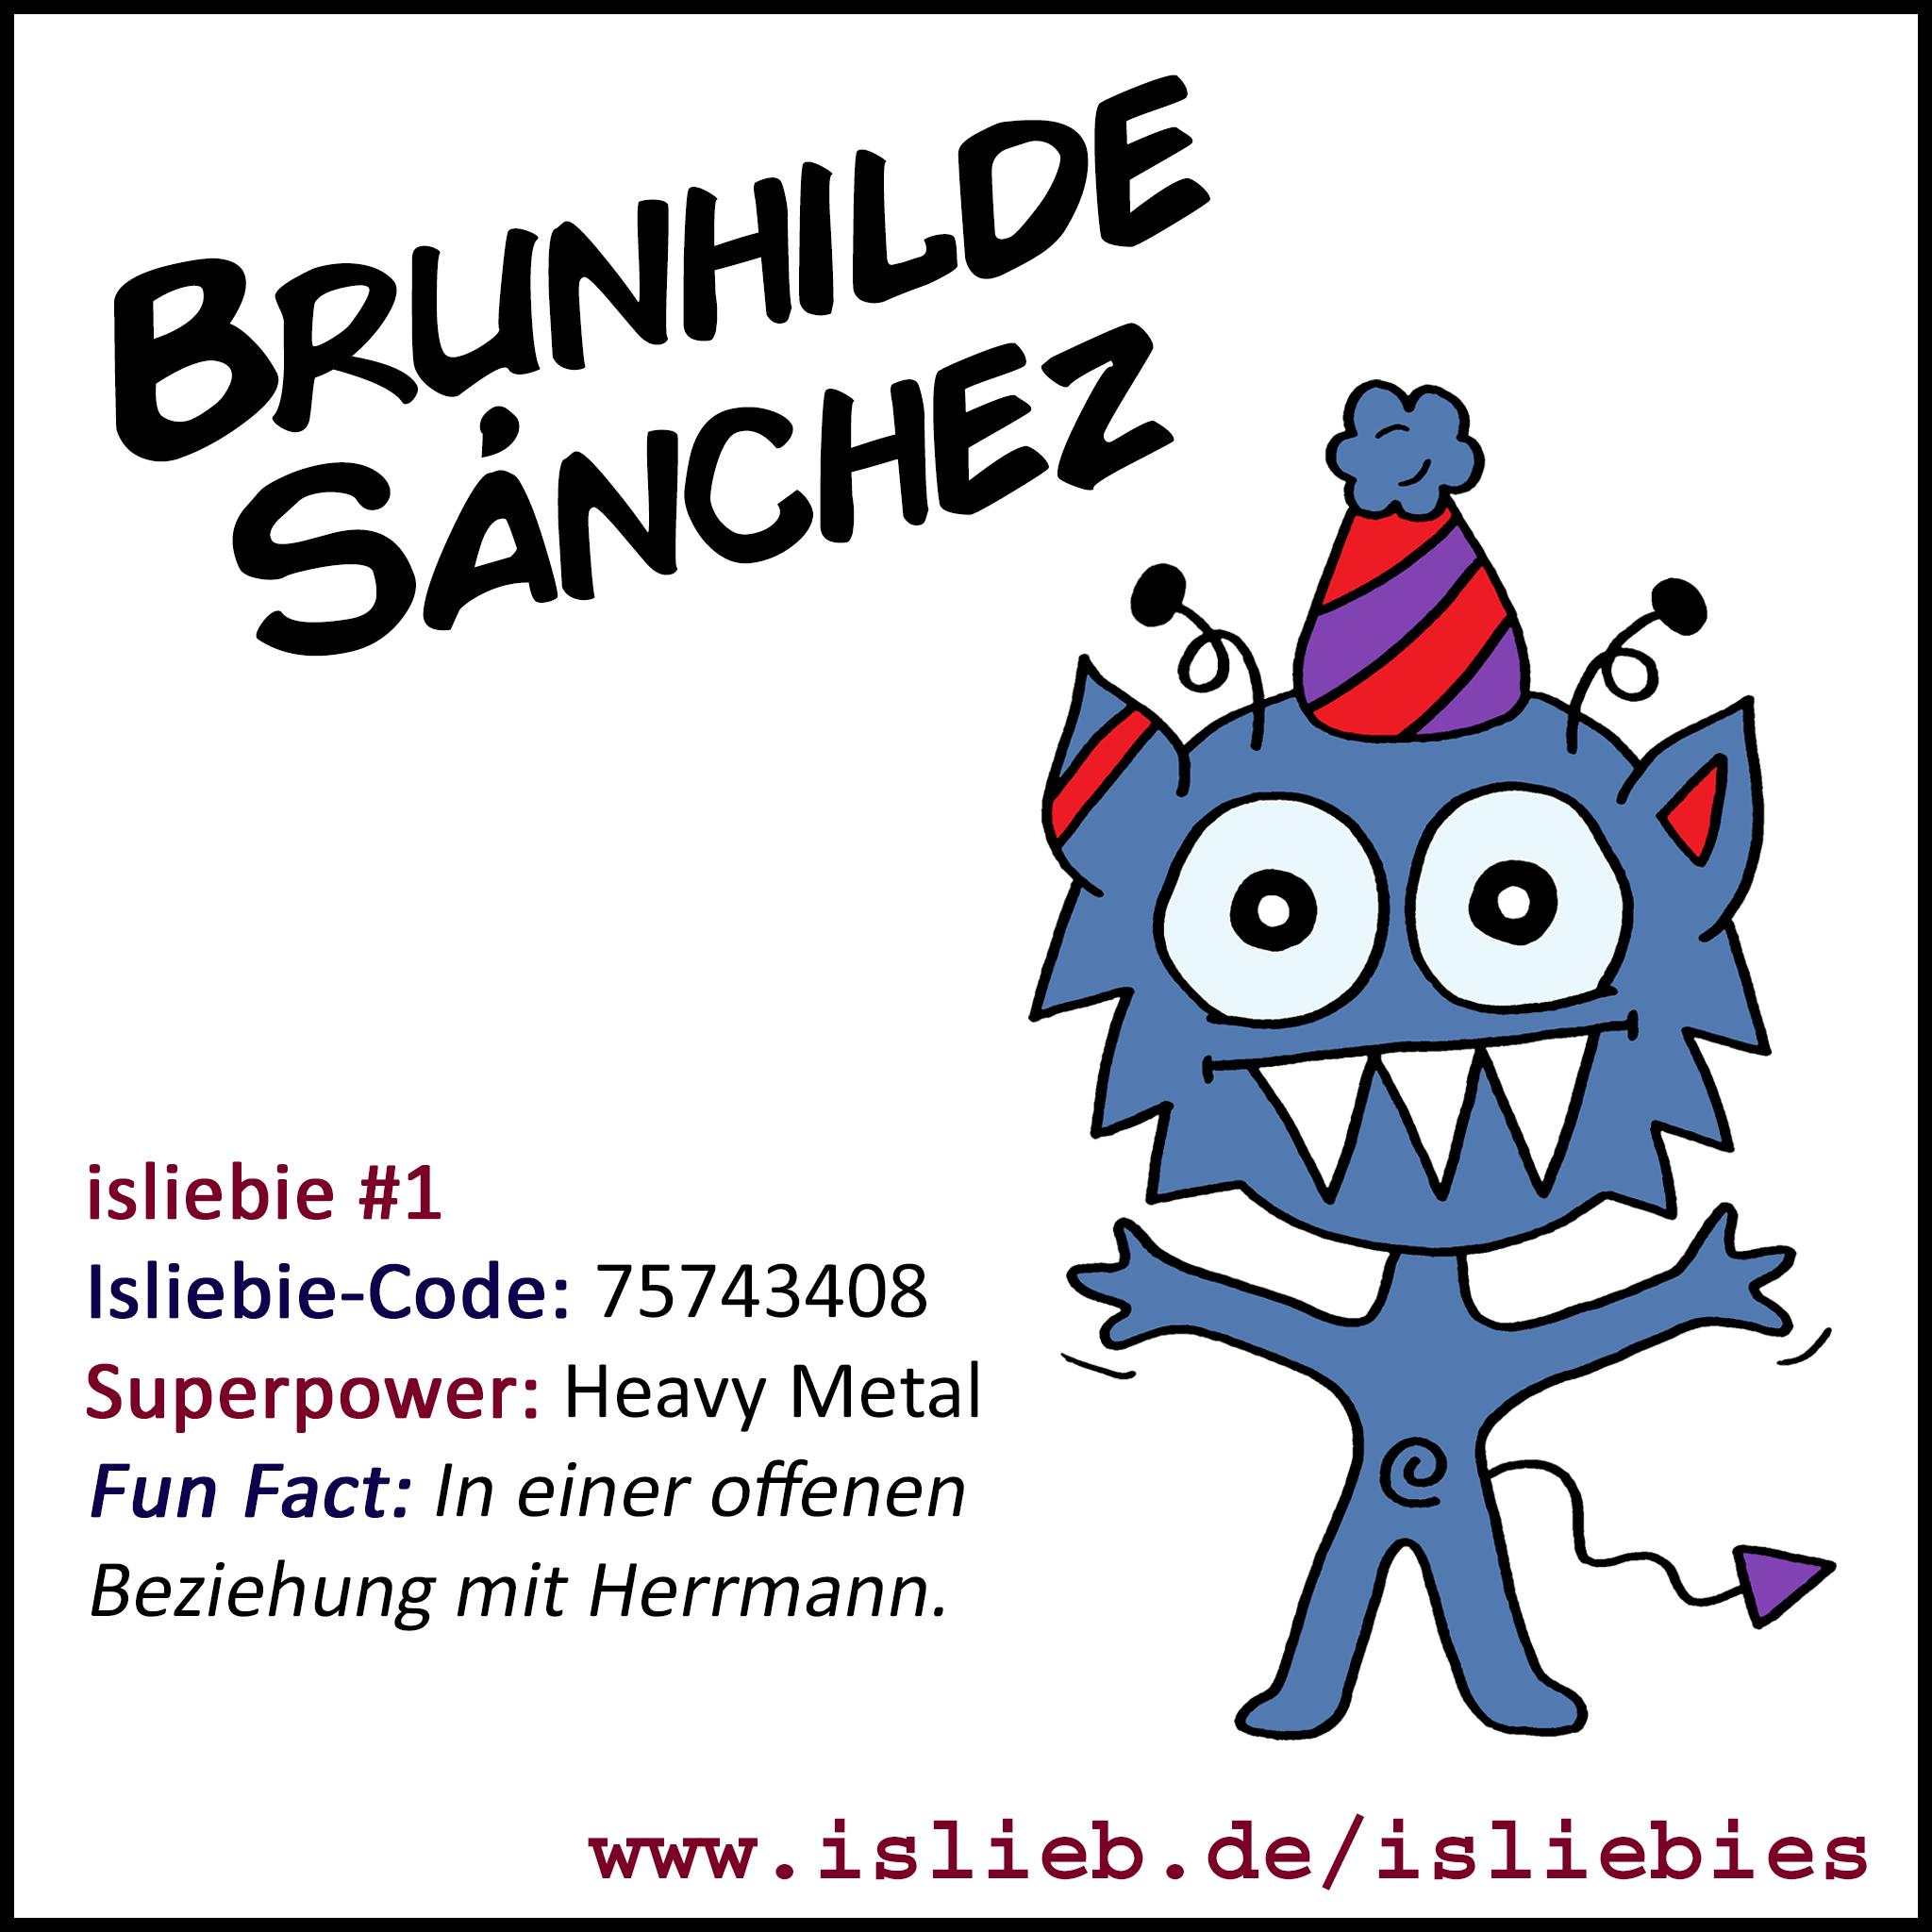 isliebie Brunhilde Sánchez